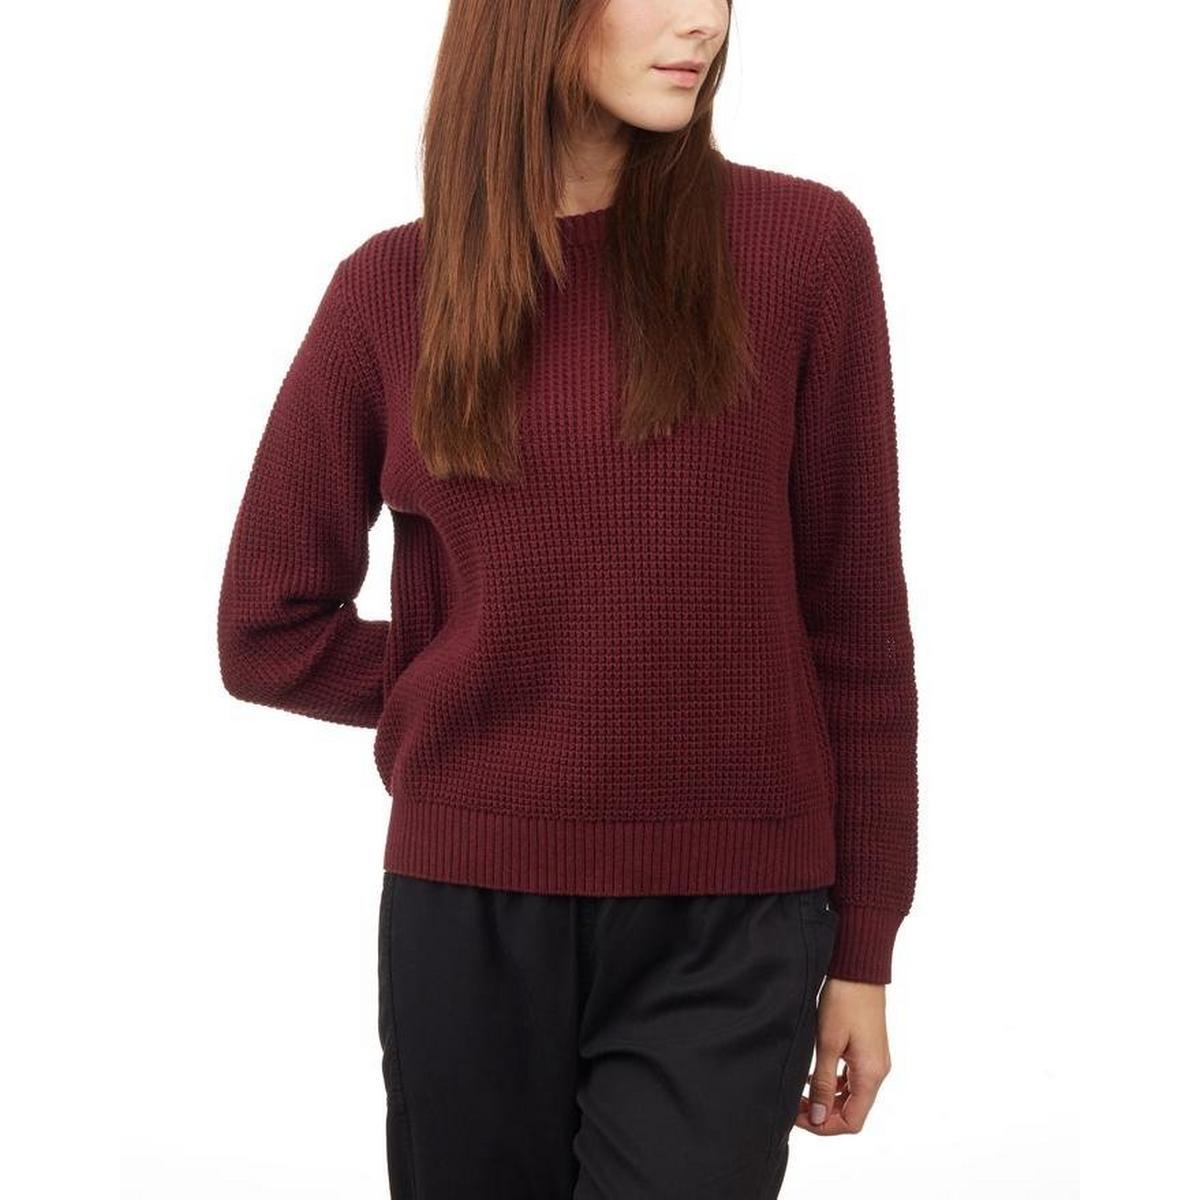 Tentree Women's Highline Cotton Crew Sweater - Red Mahogany